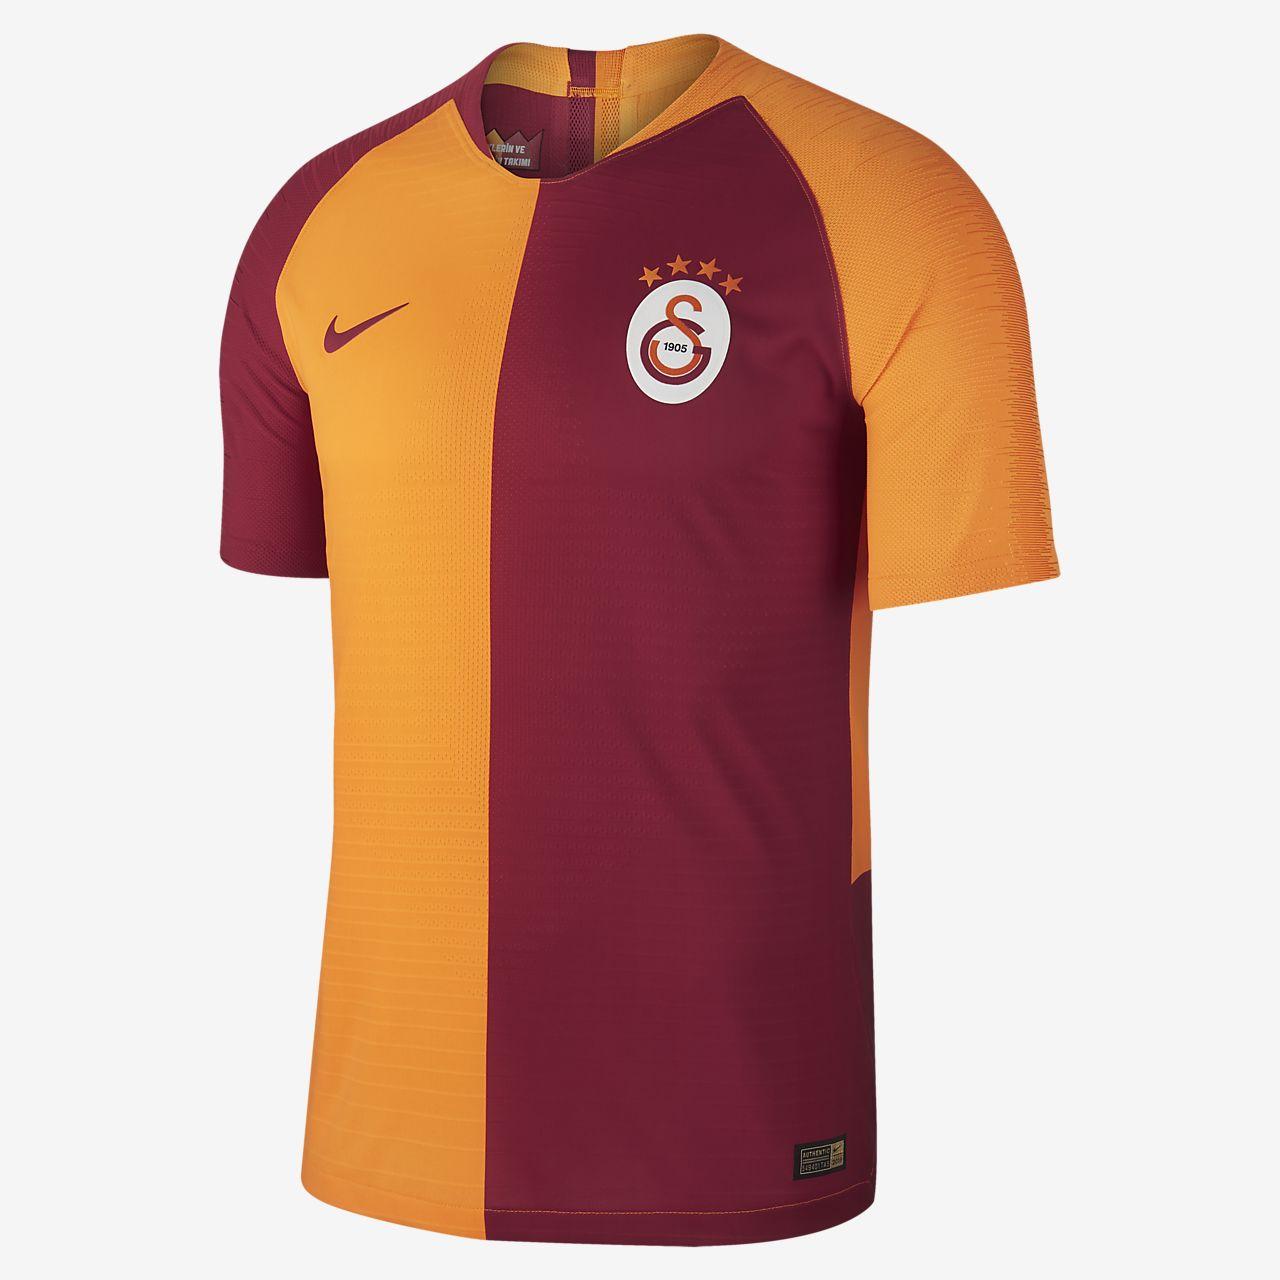 ... Camiseta de fútbol para hombre de local Vapor Match del Galatasaray  S.K. 2018 19 b423b5b25f7